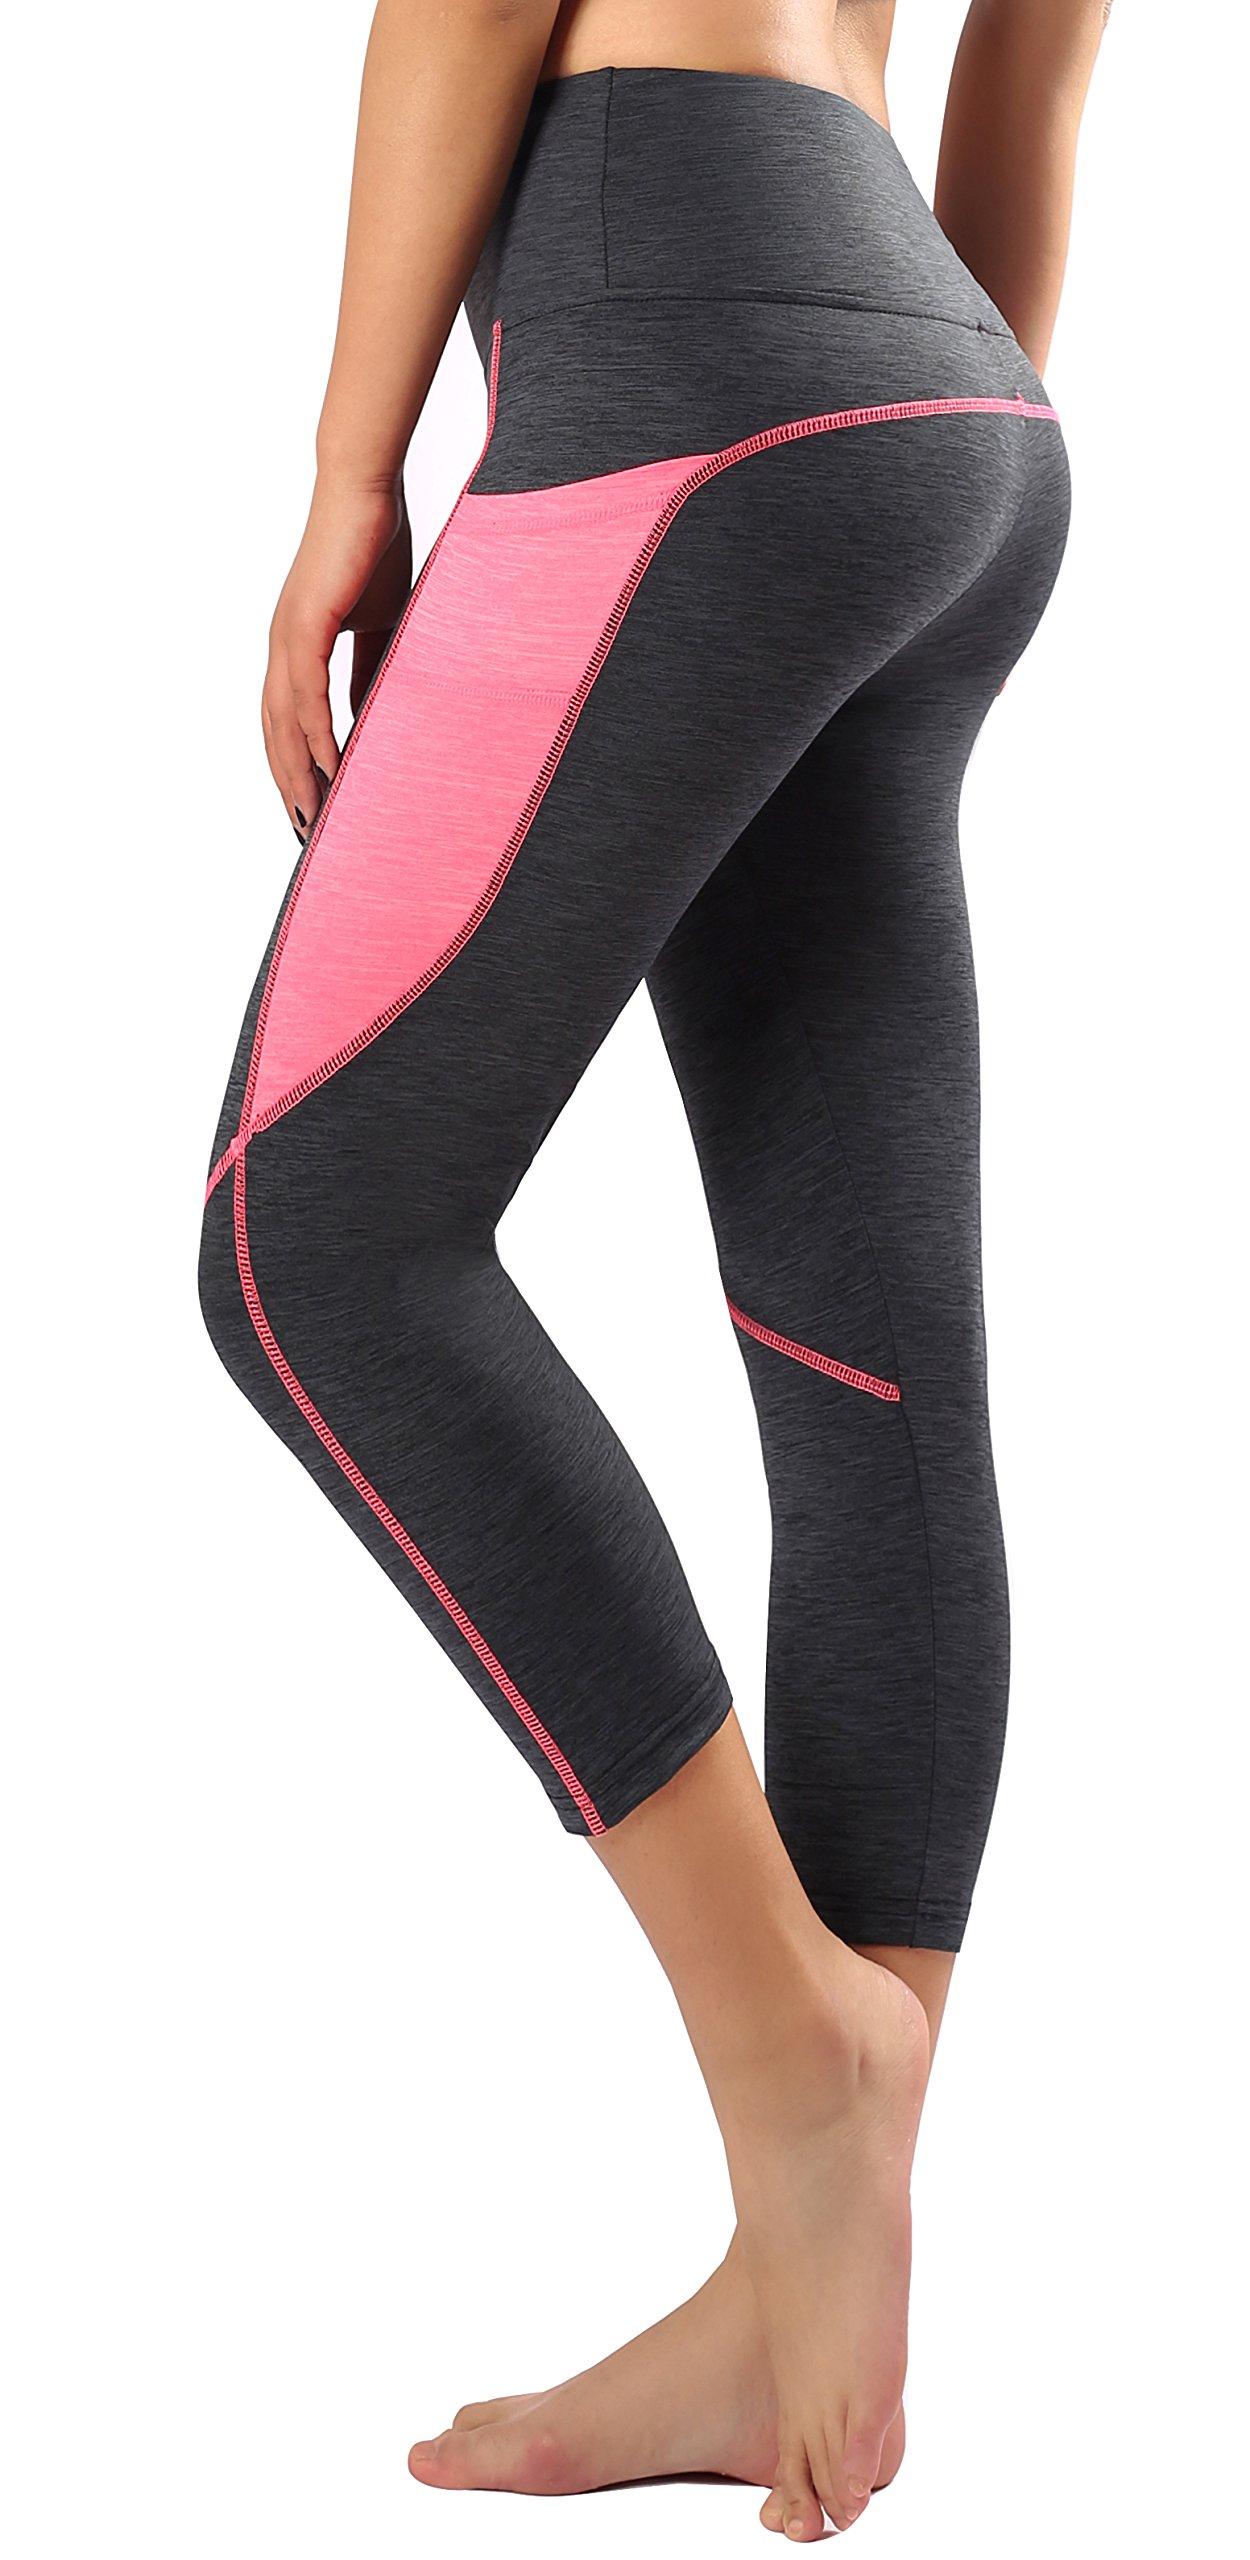 Sugar Pocket Legging de Sport Femme Stretch Yoga Jogging Fitness Running  Taille Haute avec Poche 15c727be359